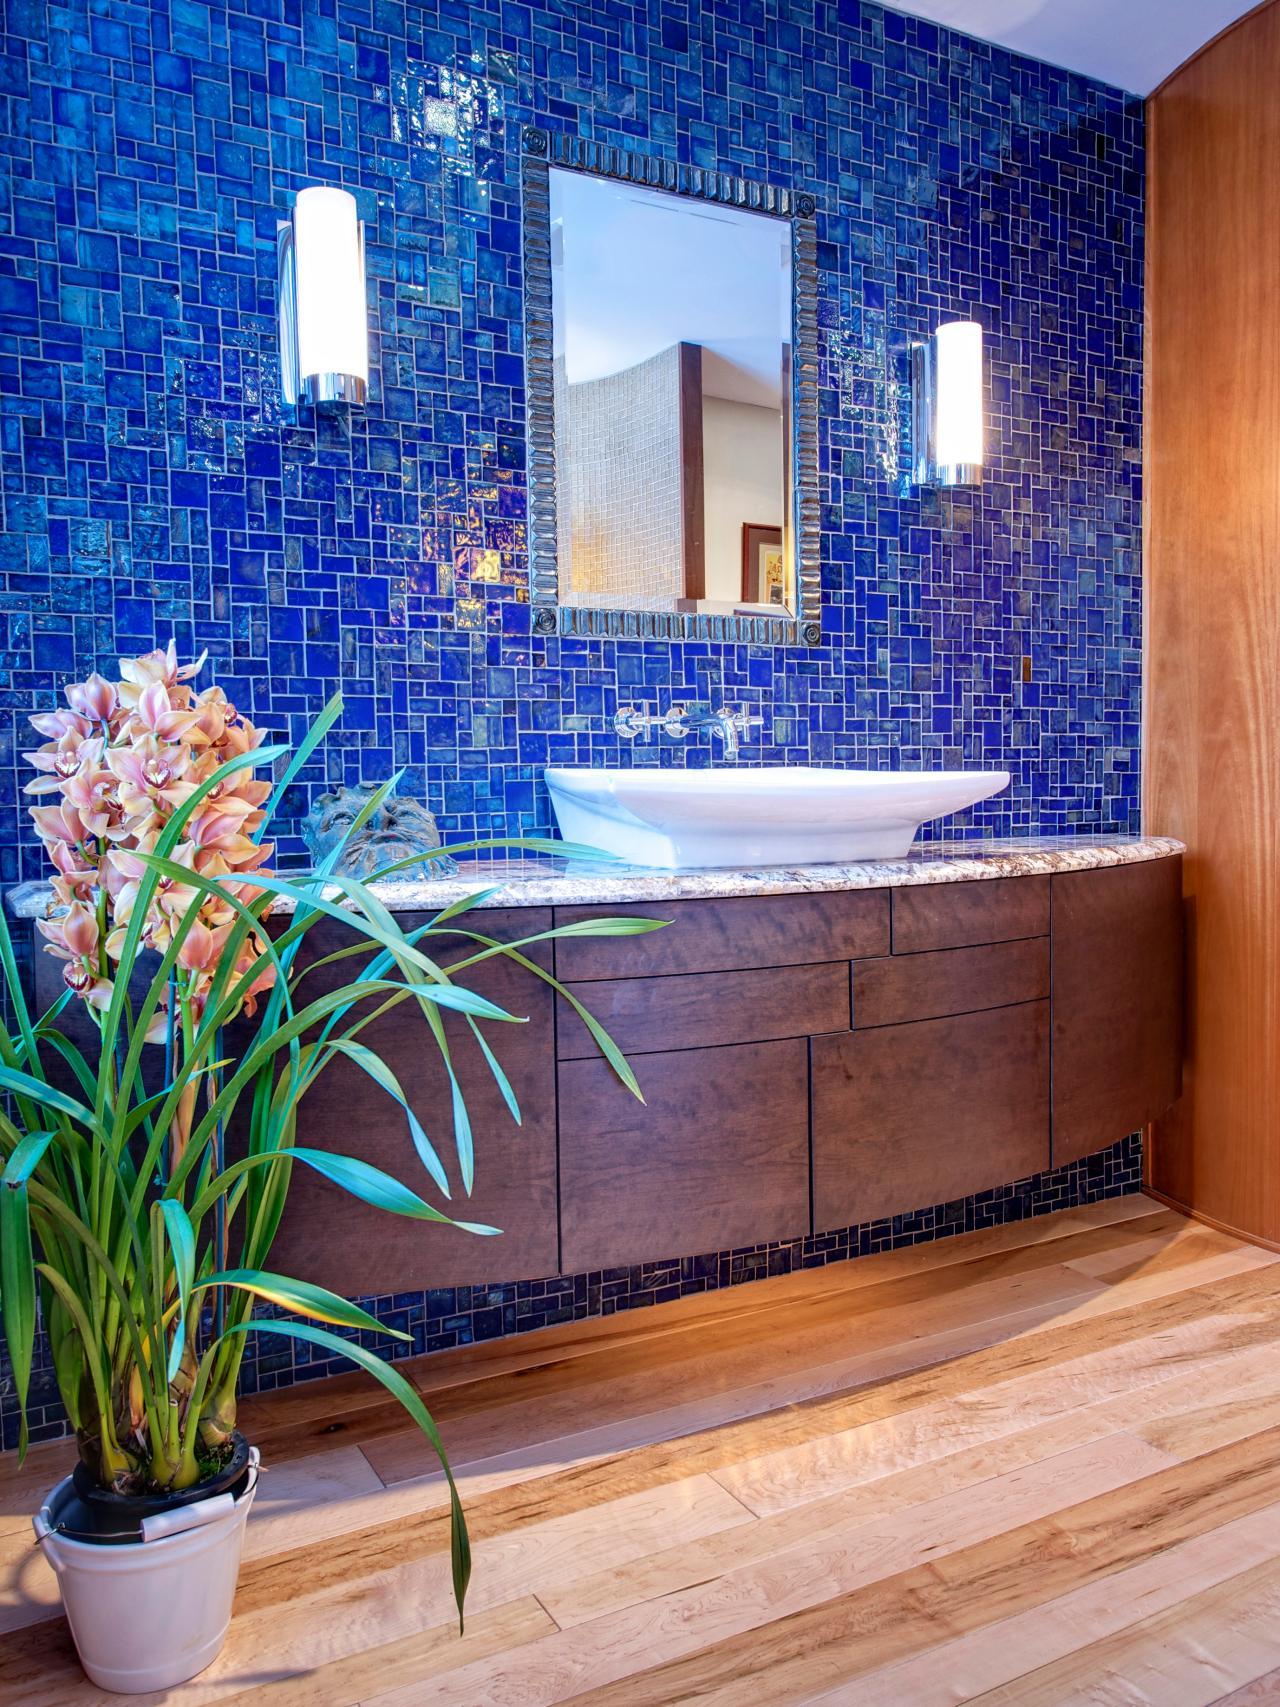 DP_David-Stimmel-Contemporary-Bathroom-Blue-Backsplash-Vanity_s3x4.jpg.rend.hgtvcom.1280.1707